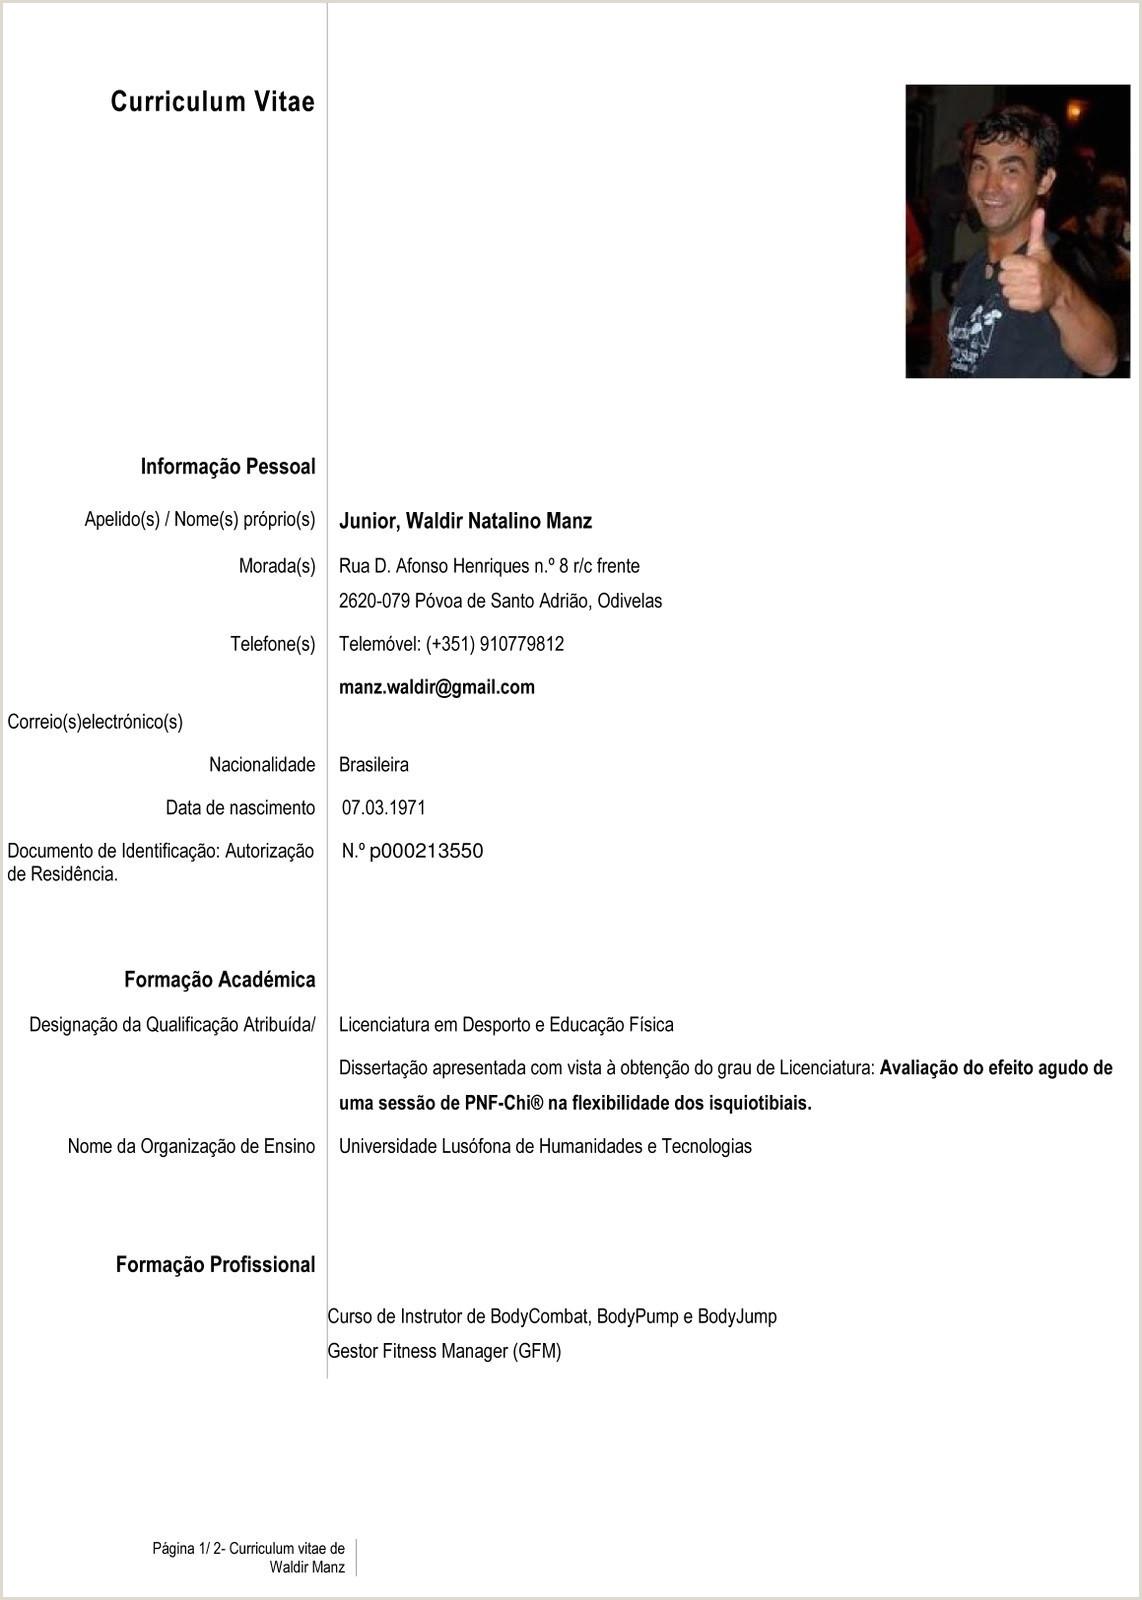 Descargar Plantilla Curriculum Vitae Gratis Listo Para Rellenar En Español Nathan Crawford – Page 2